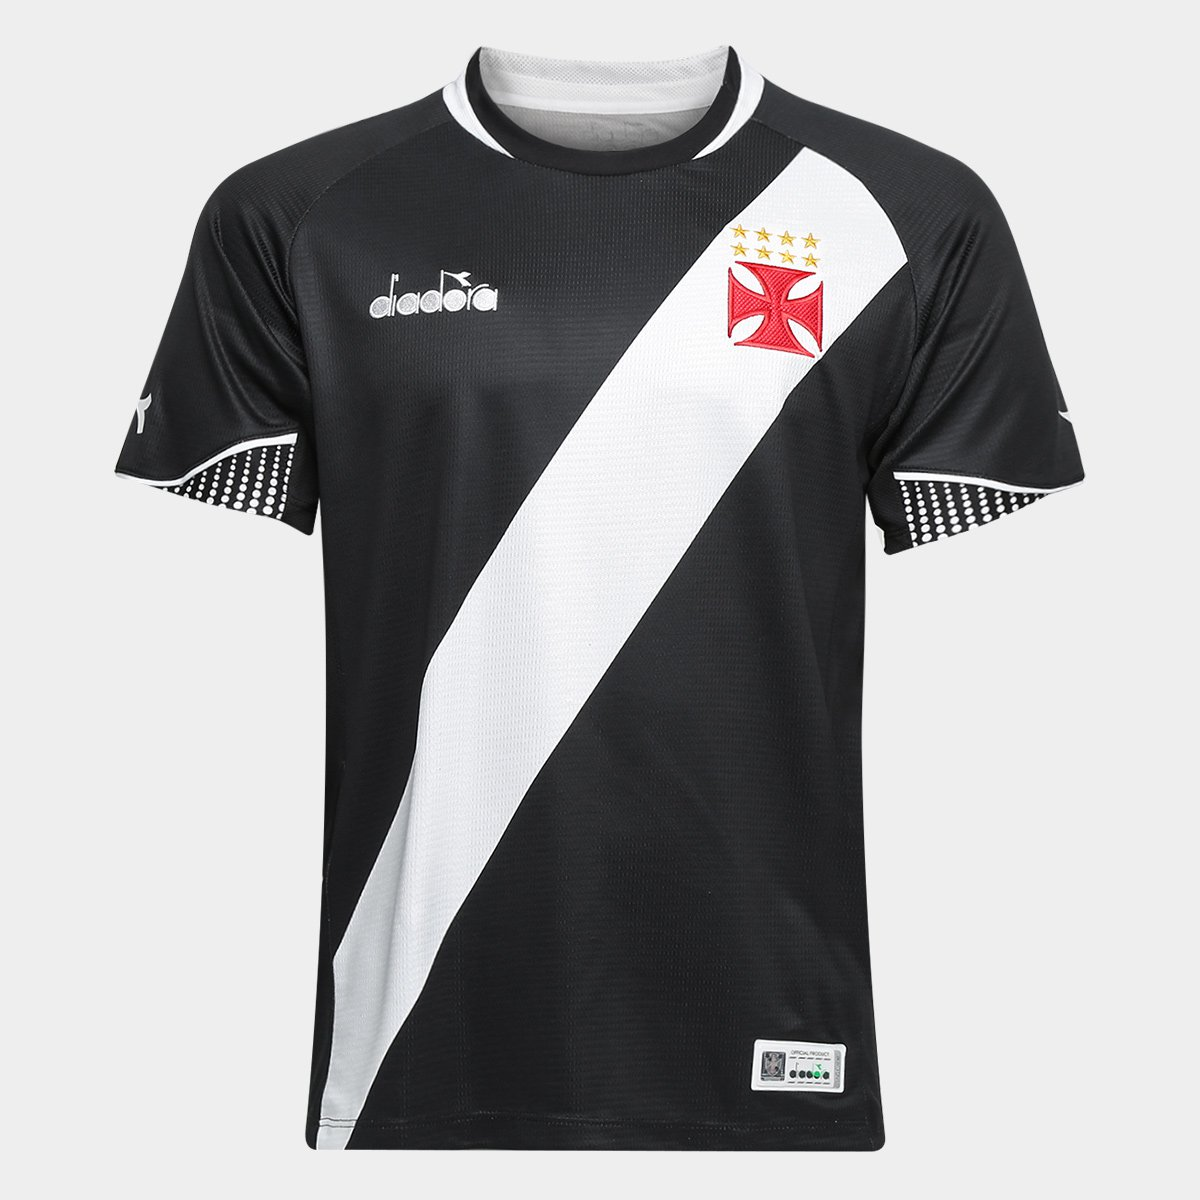 Camisa Vasco I 2018 s n° - Torcedor Diadora Masculina - Preto ... 7e4b9ee872eda